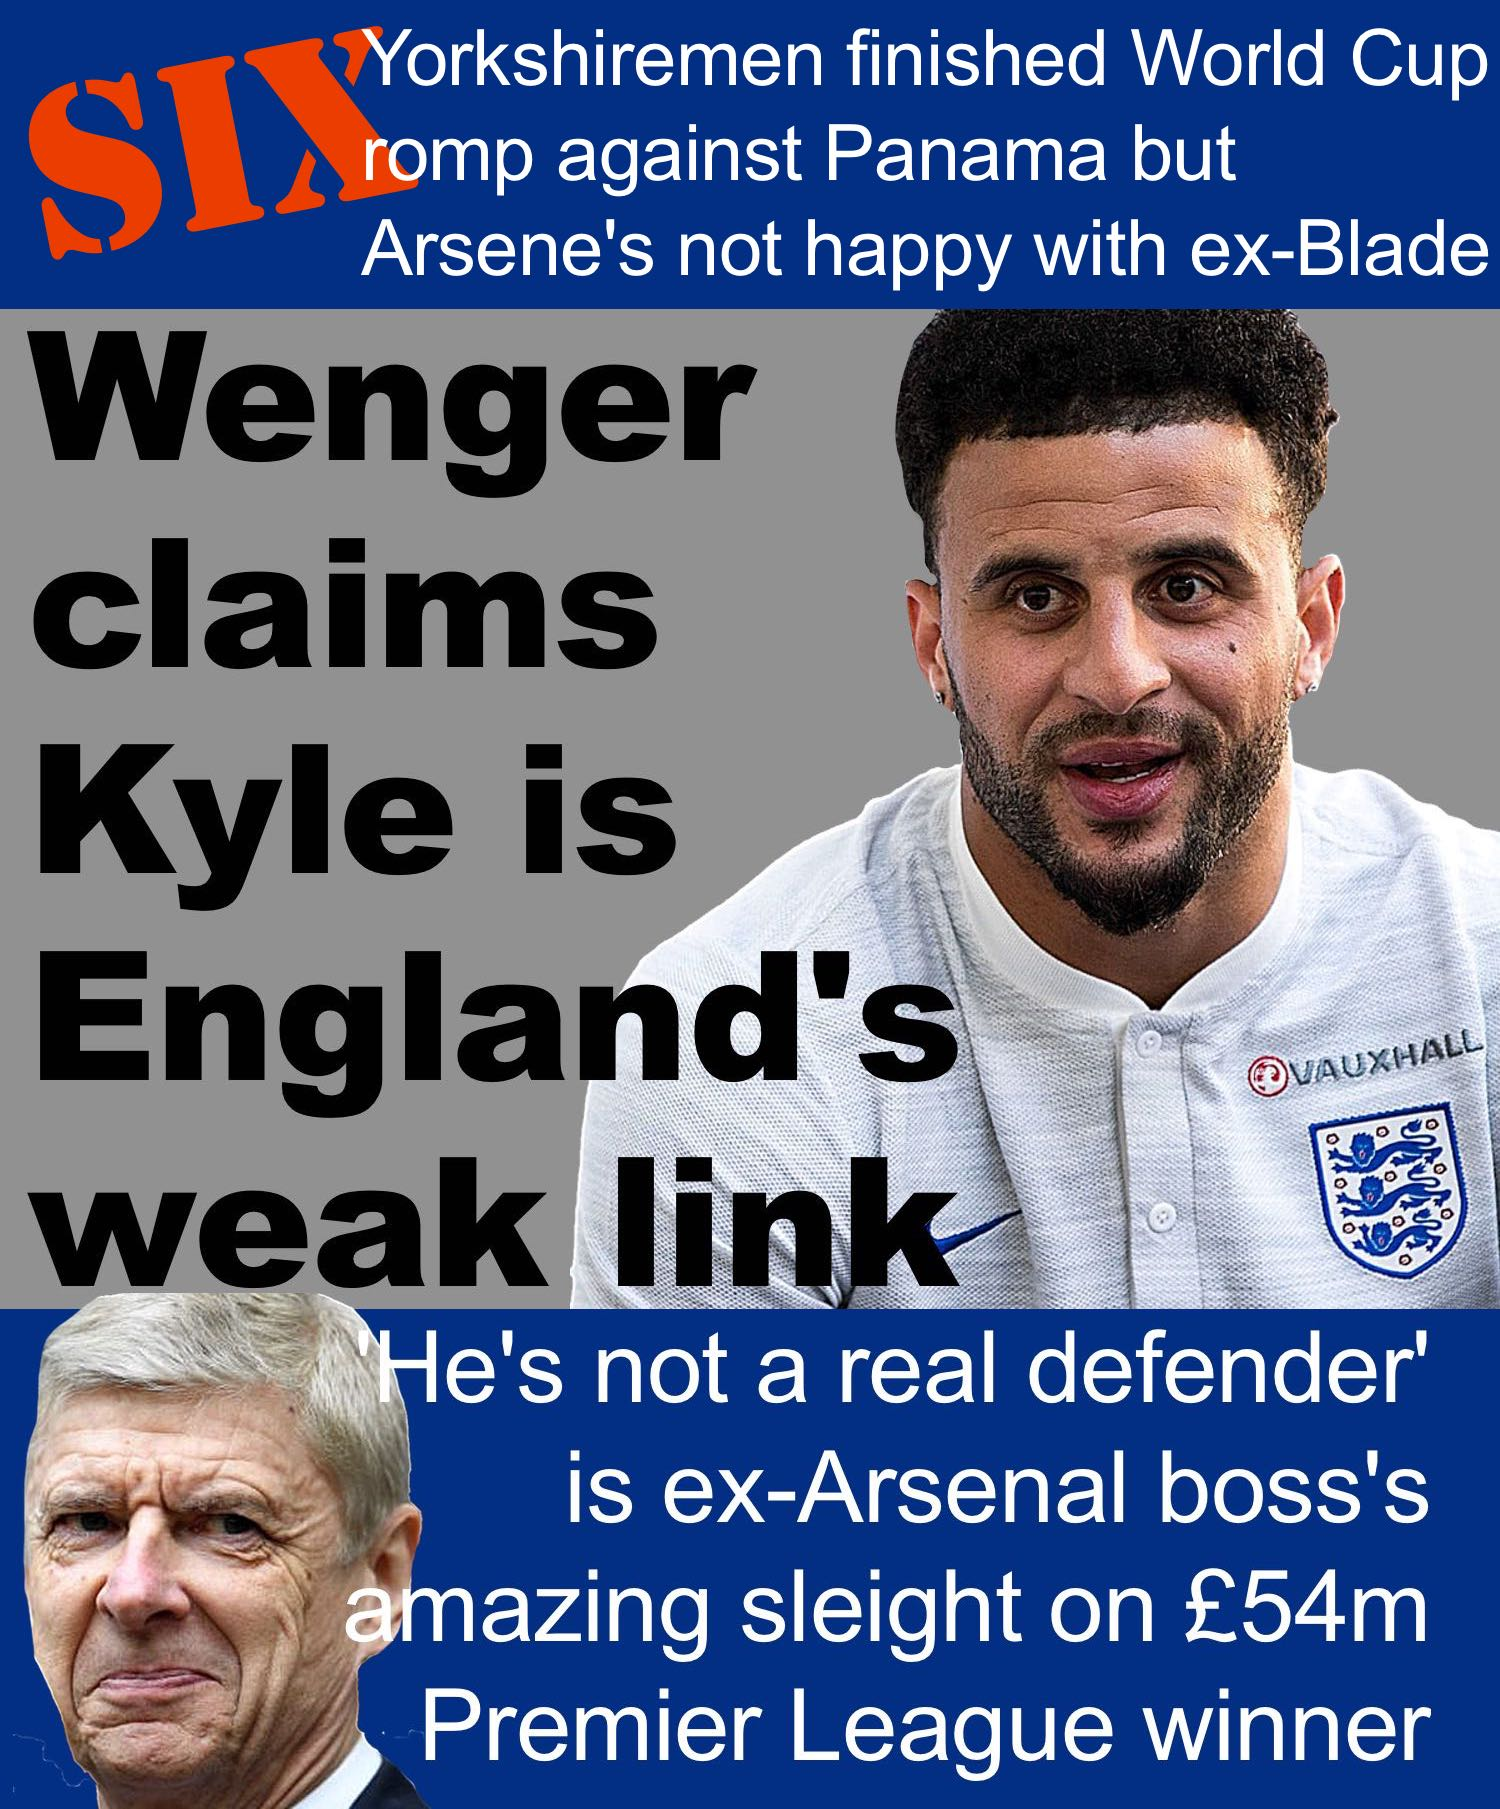 Former Sheffield United's World Cup defender subject of astonishing attack from ex-Arsenal boss Arsene Wenger